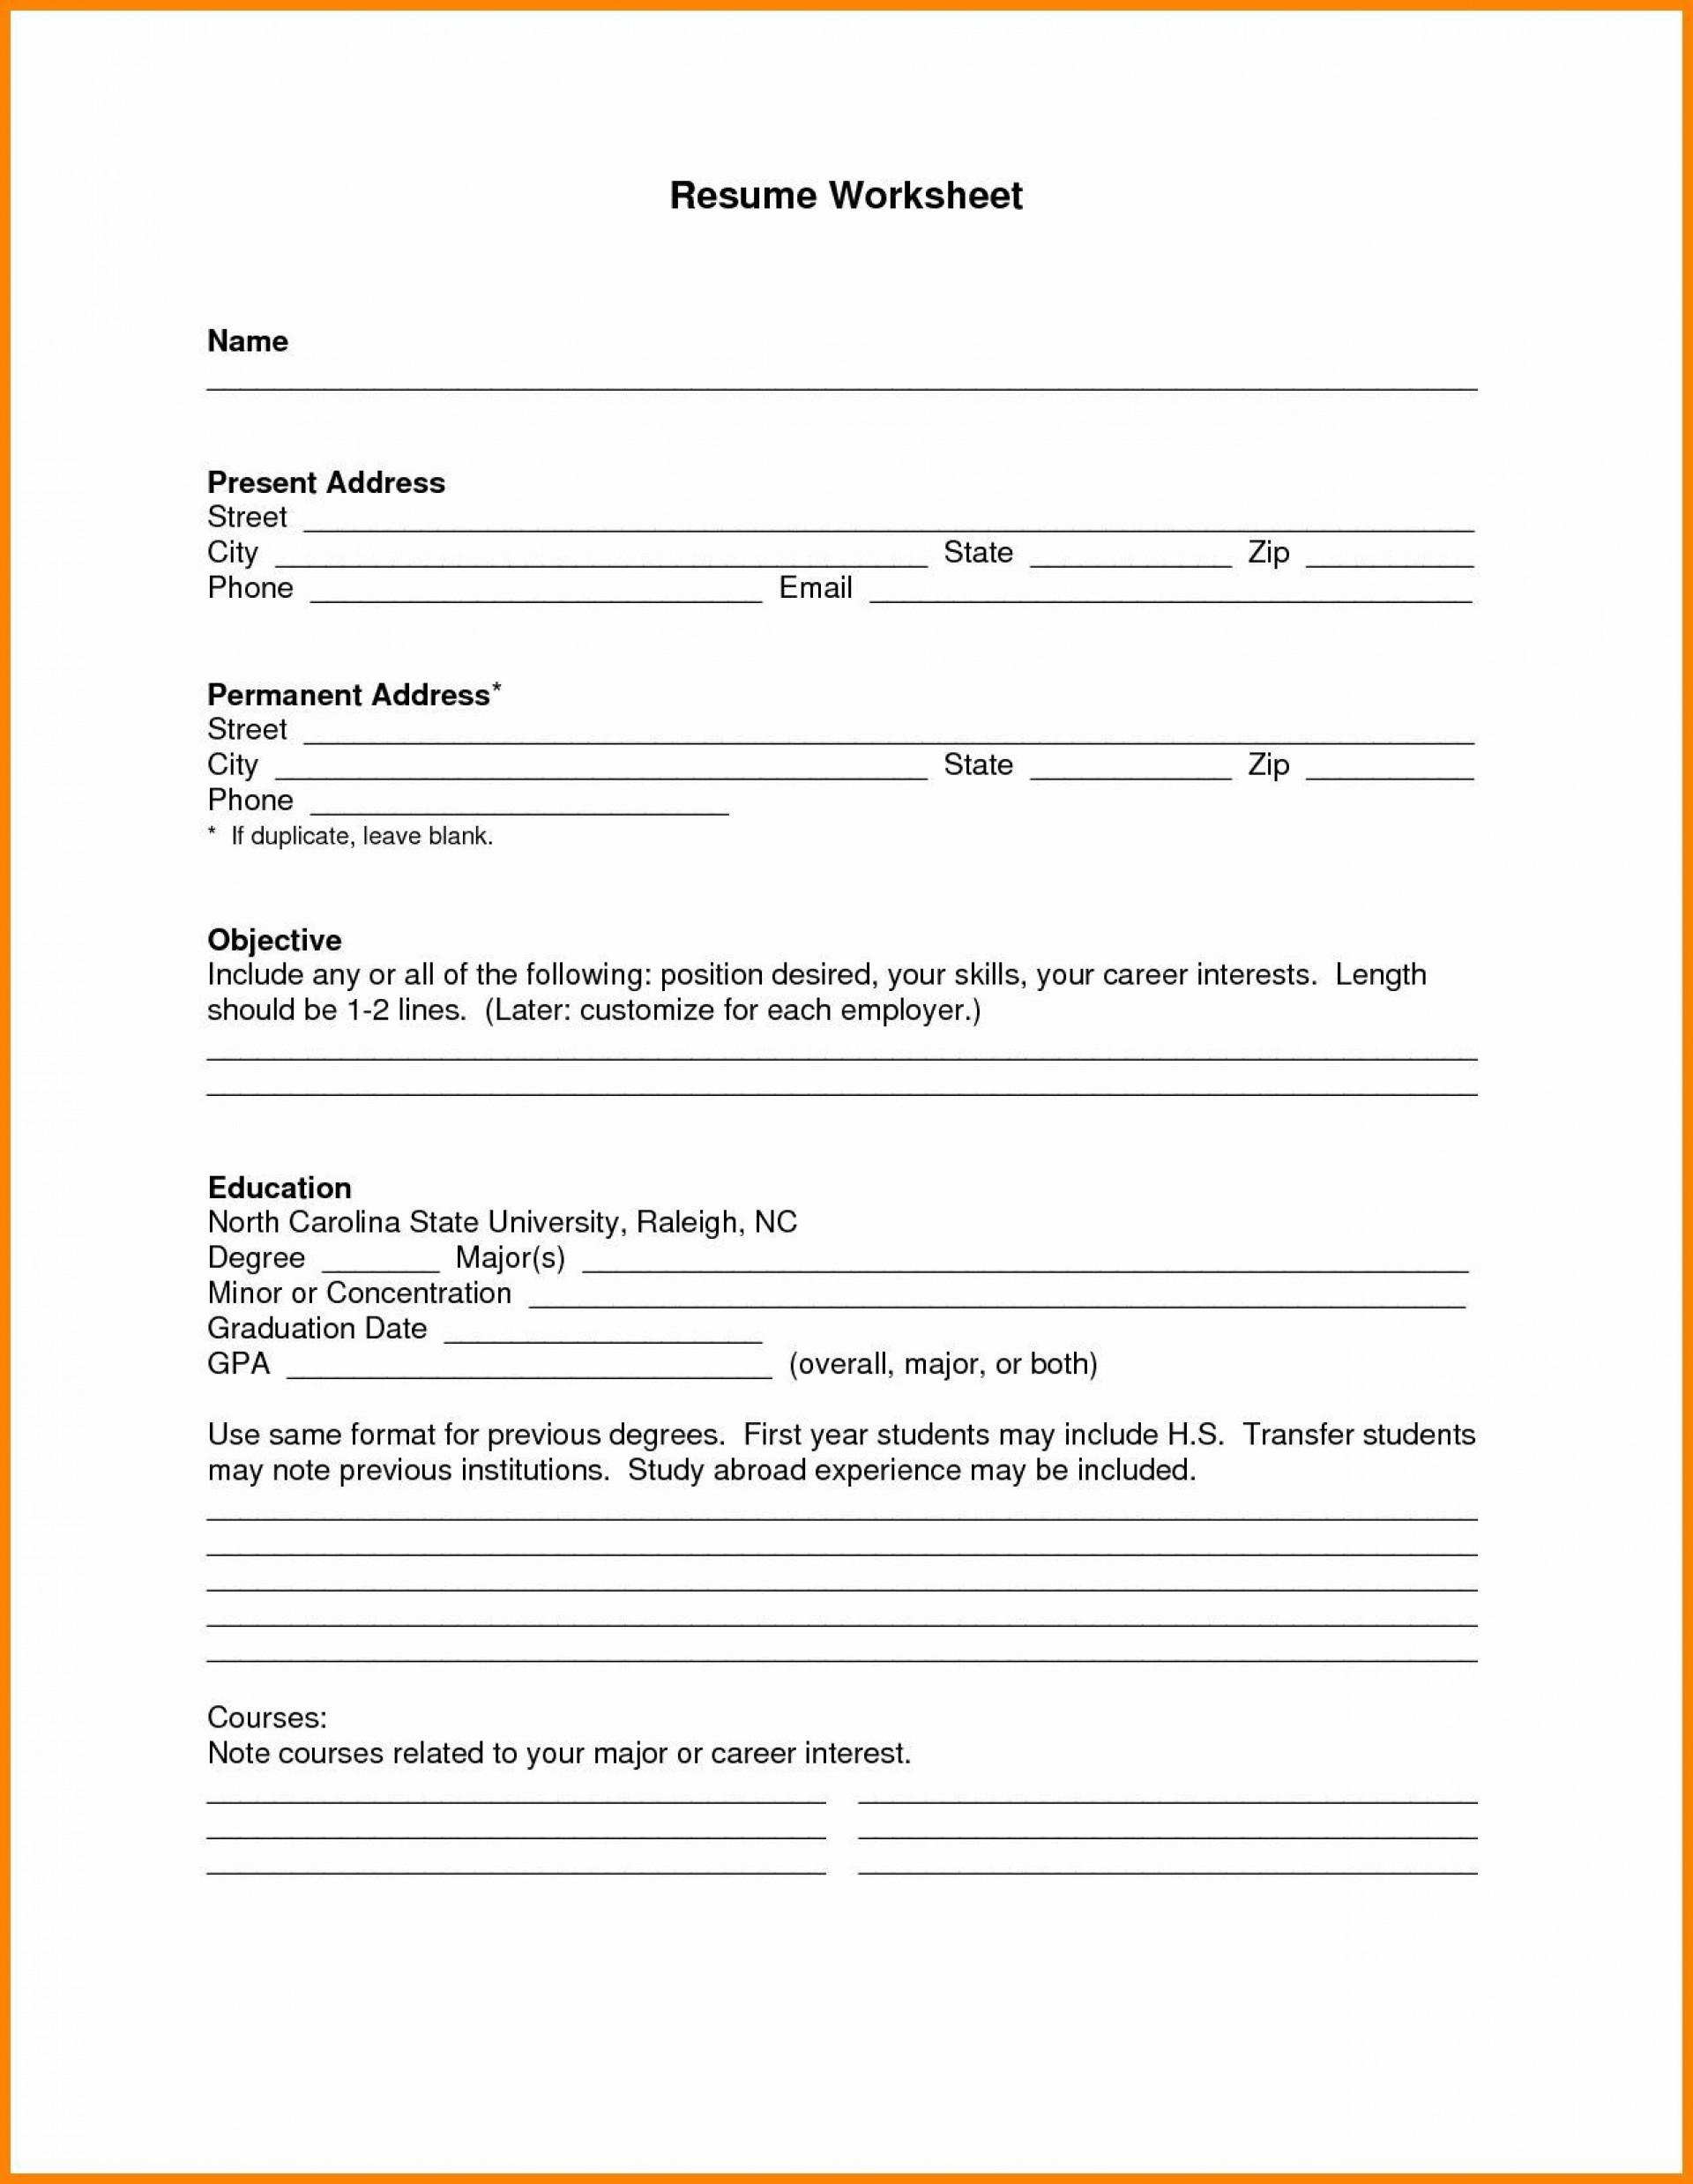 000 Simple Free Printable Resume Template Pdf Photo 1920